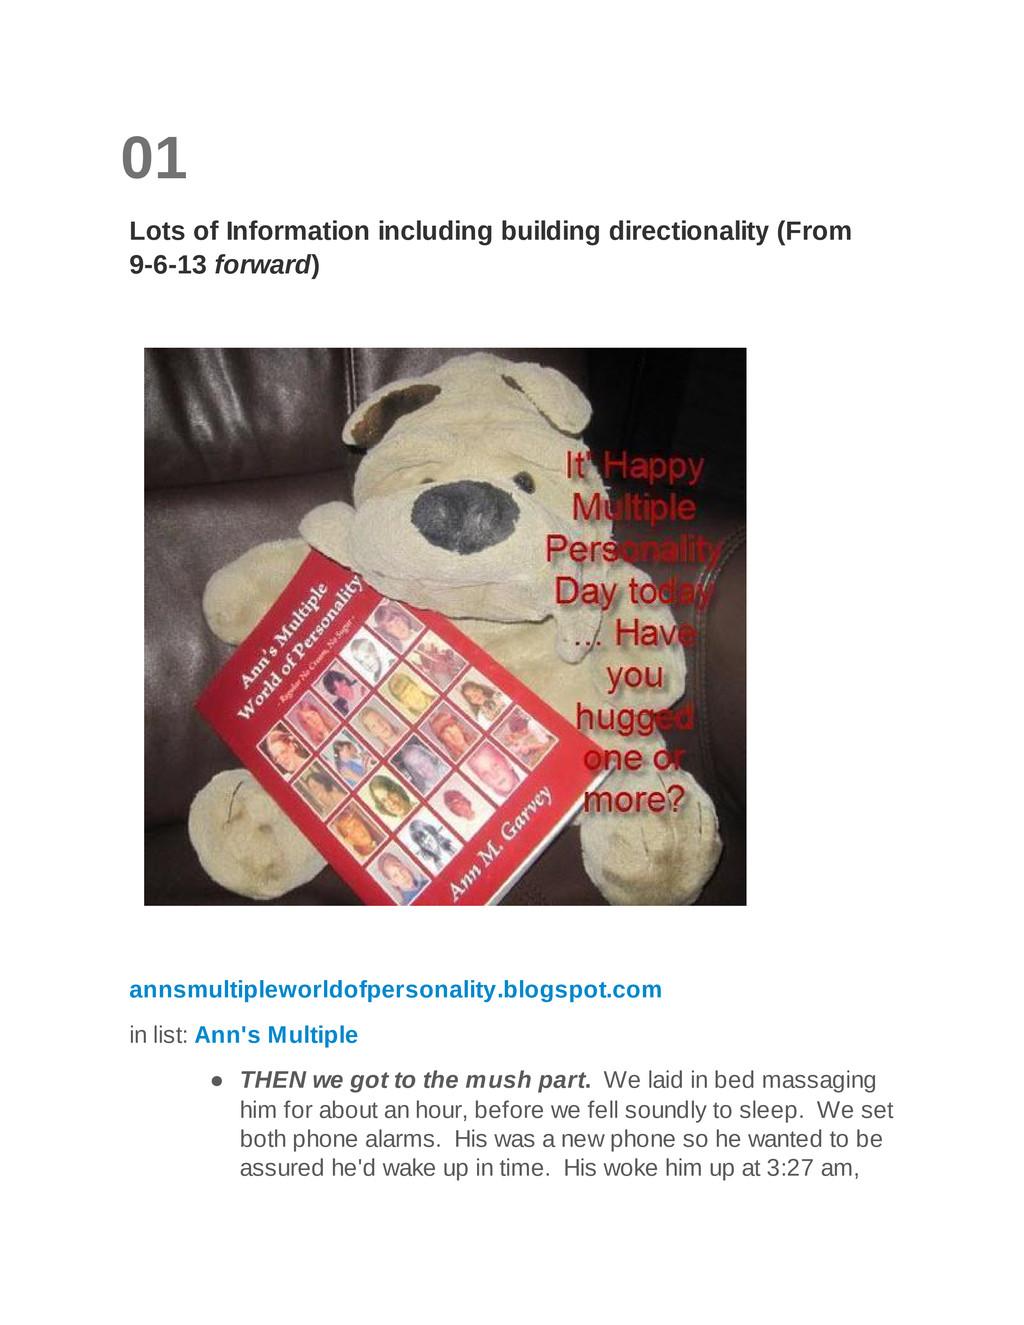 01 Lots of Information including building direc...